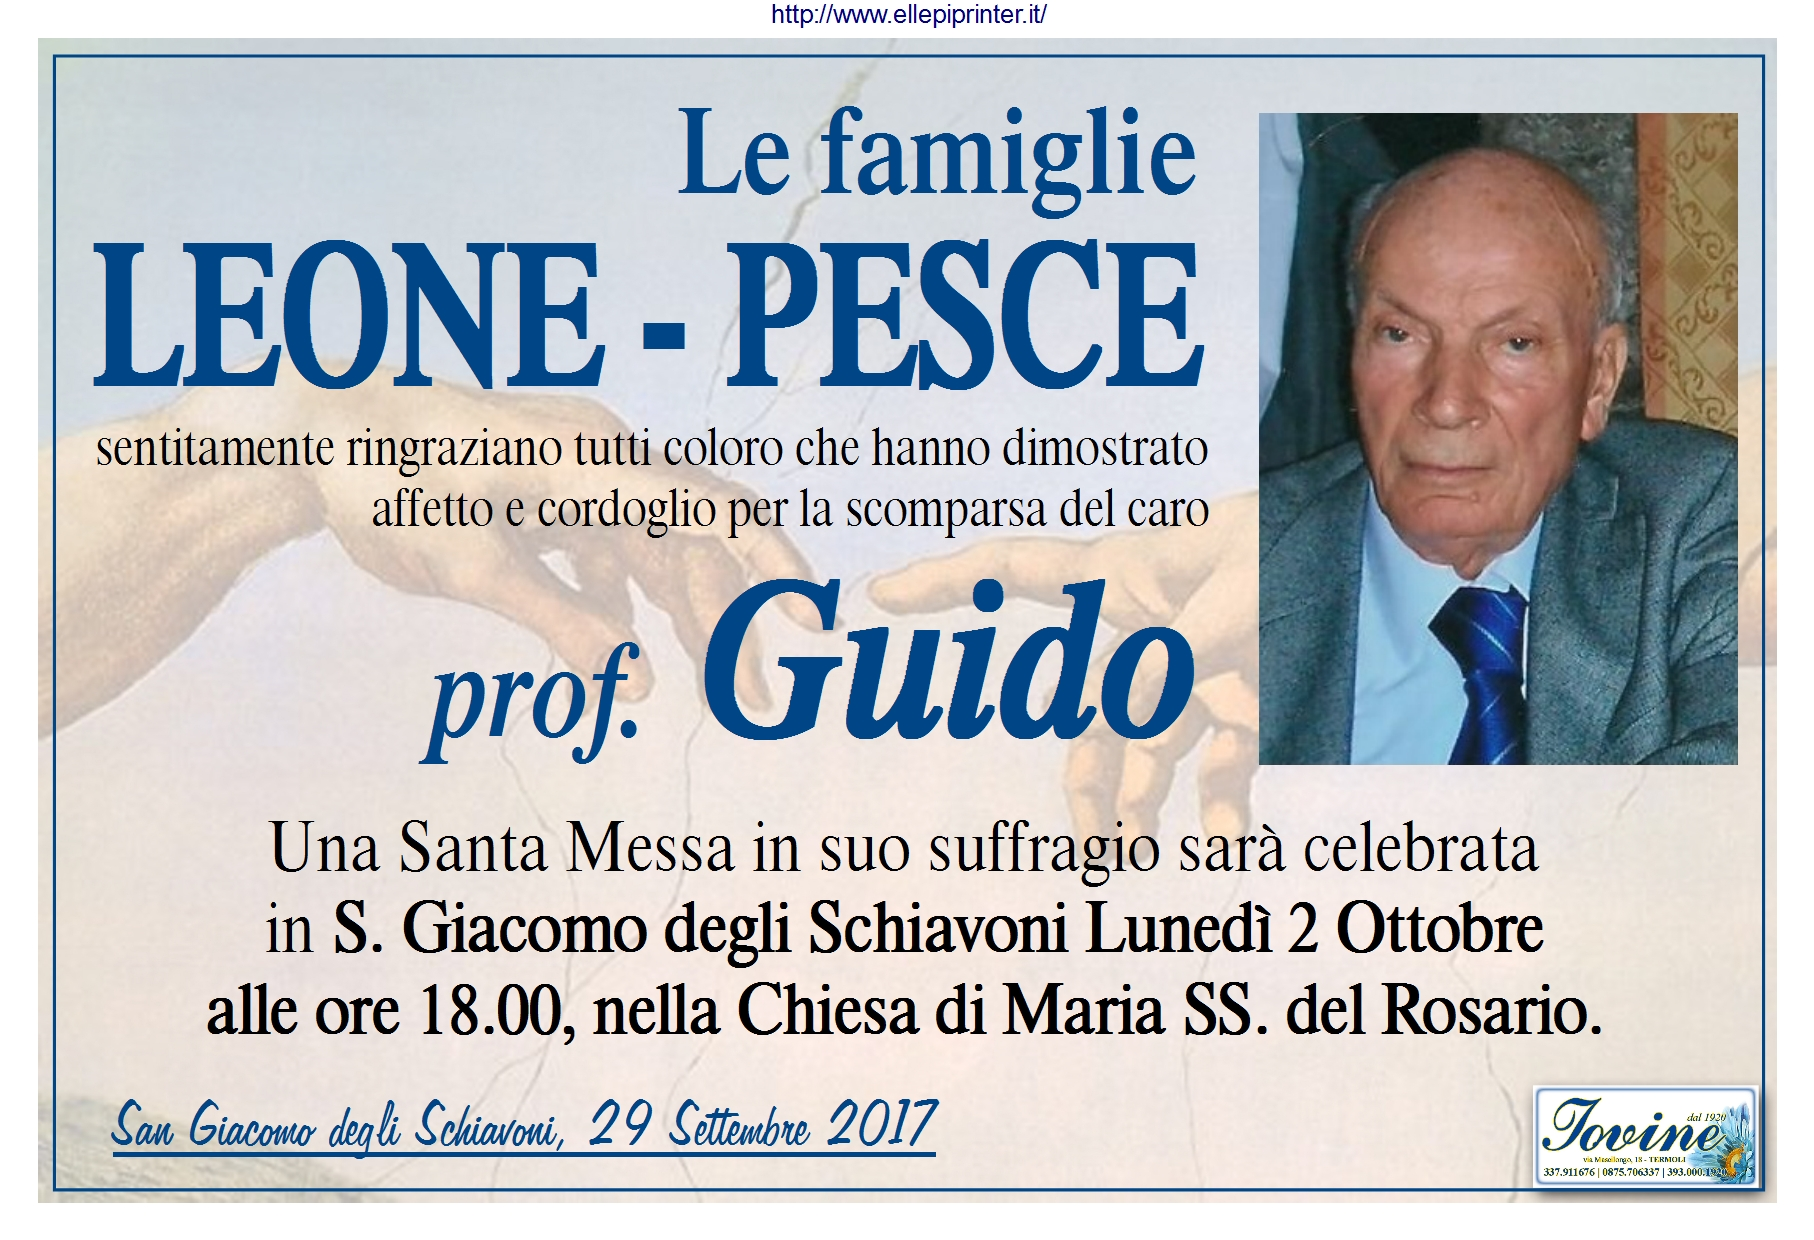 Ringraziamento Famiglie Leone, Pesce – San Giacomo degli Schiavoni